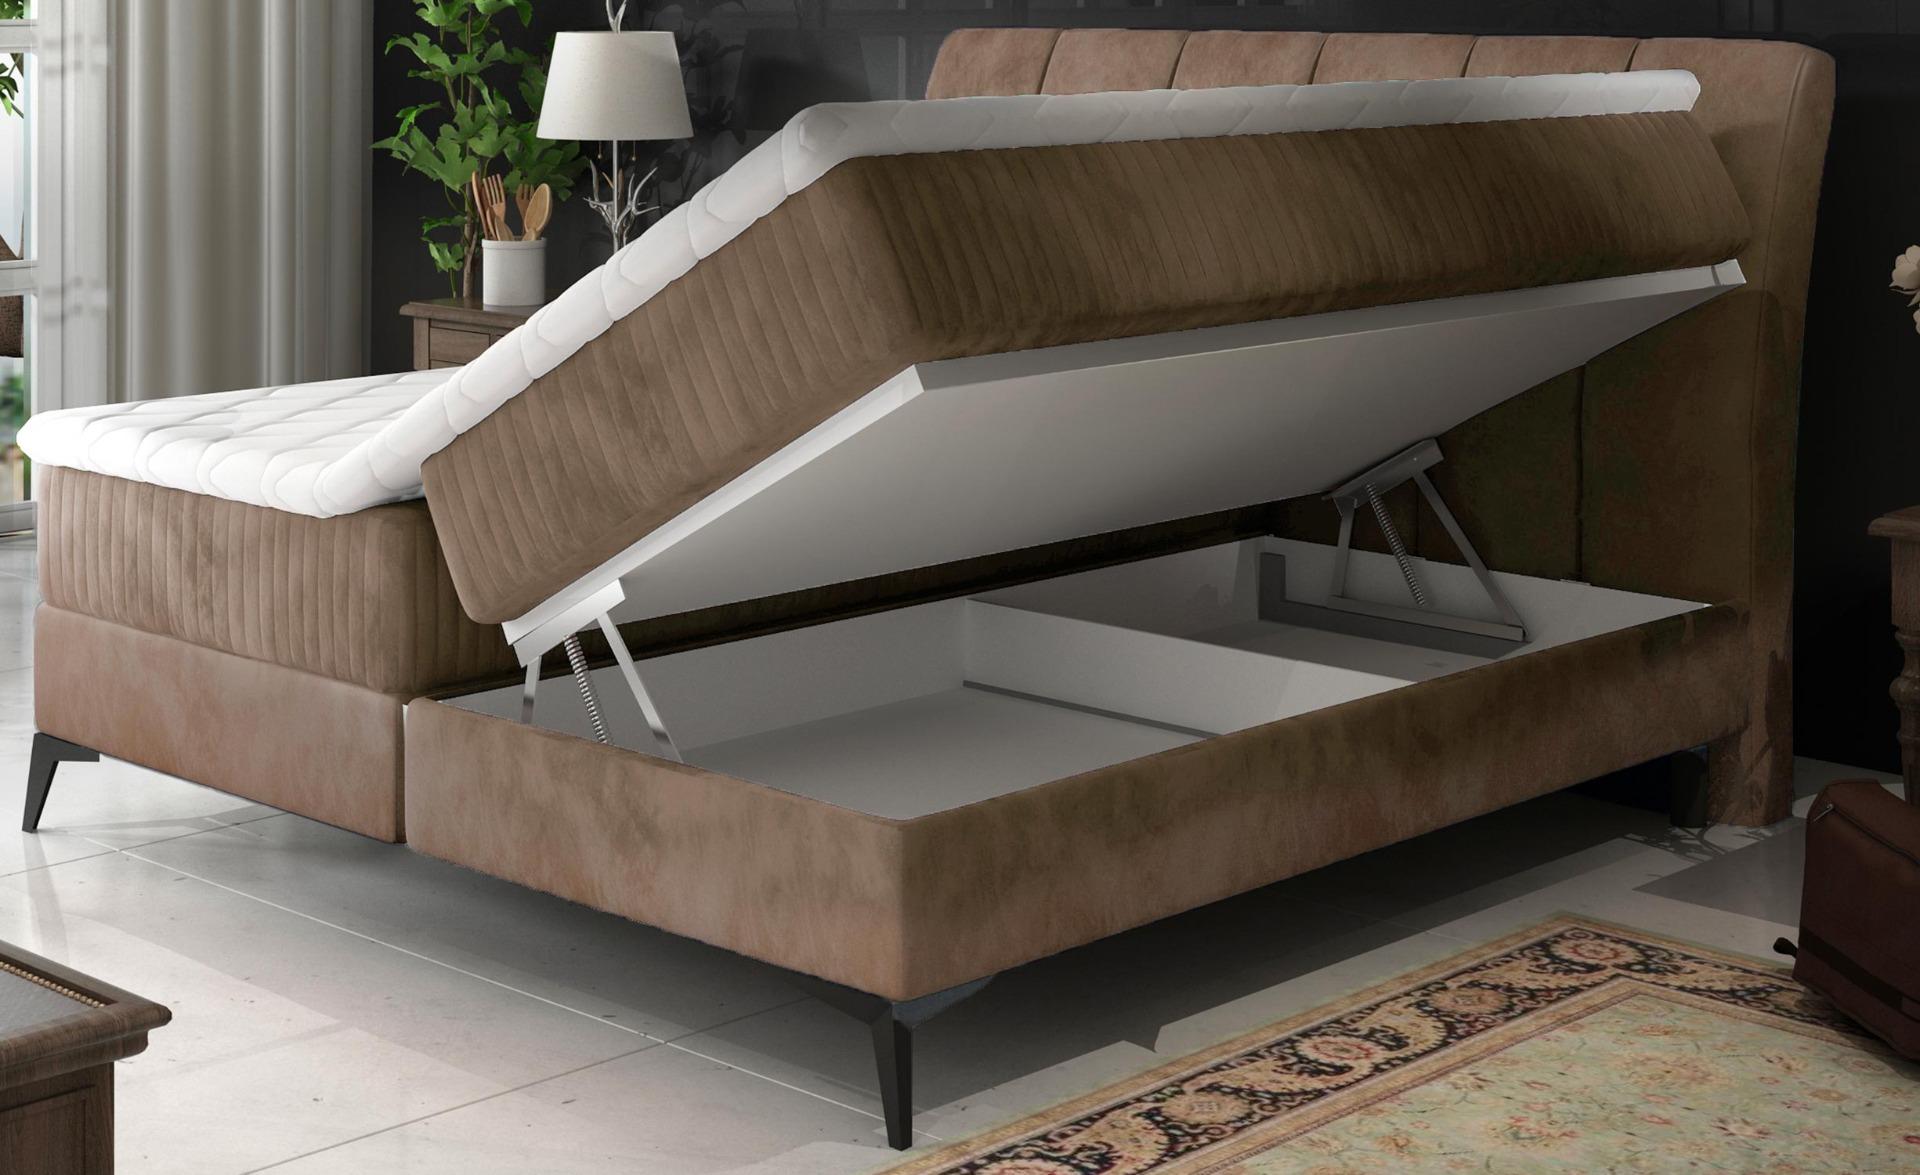 Aderito Bed met opbergruimte 140 cm Taupe Fluweel